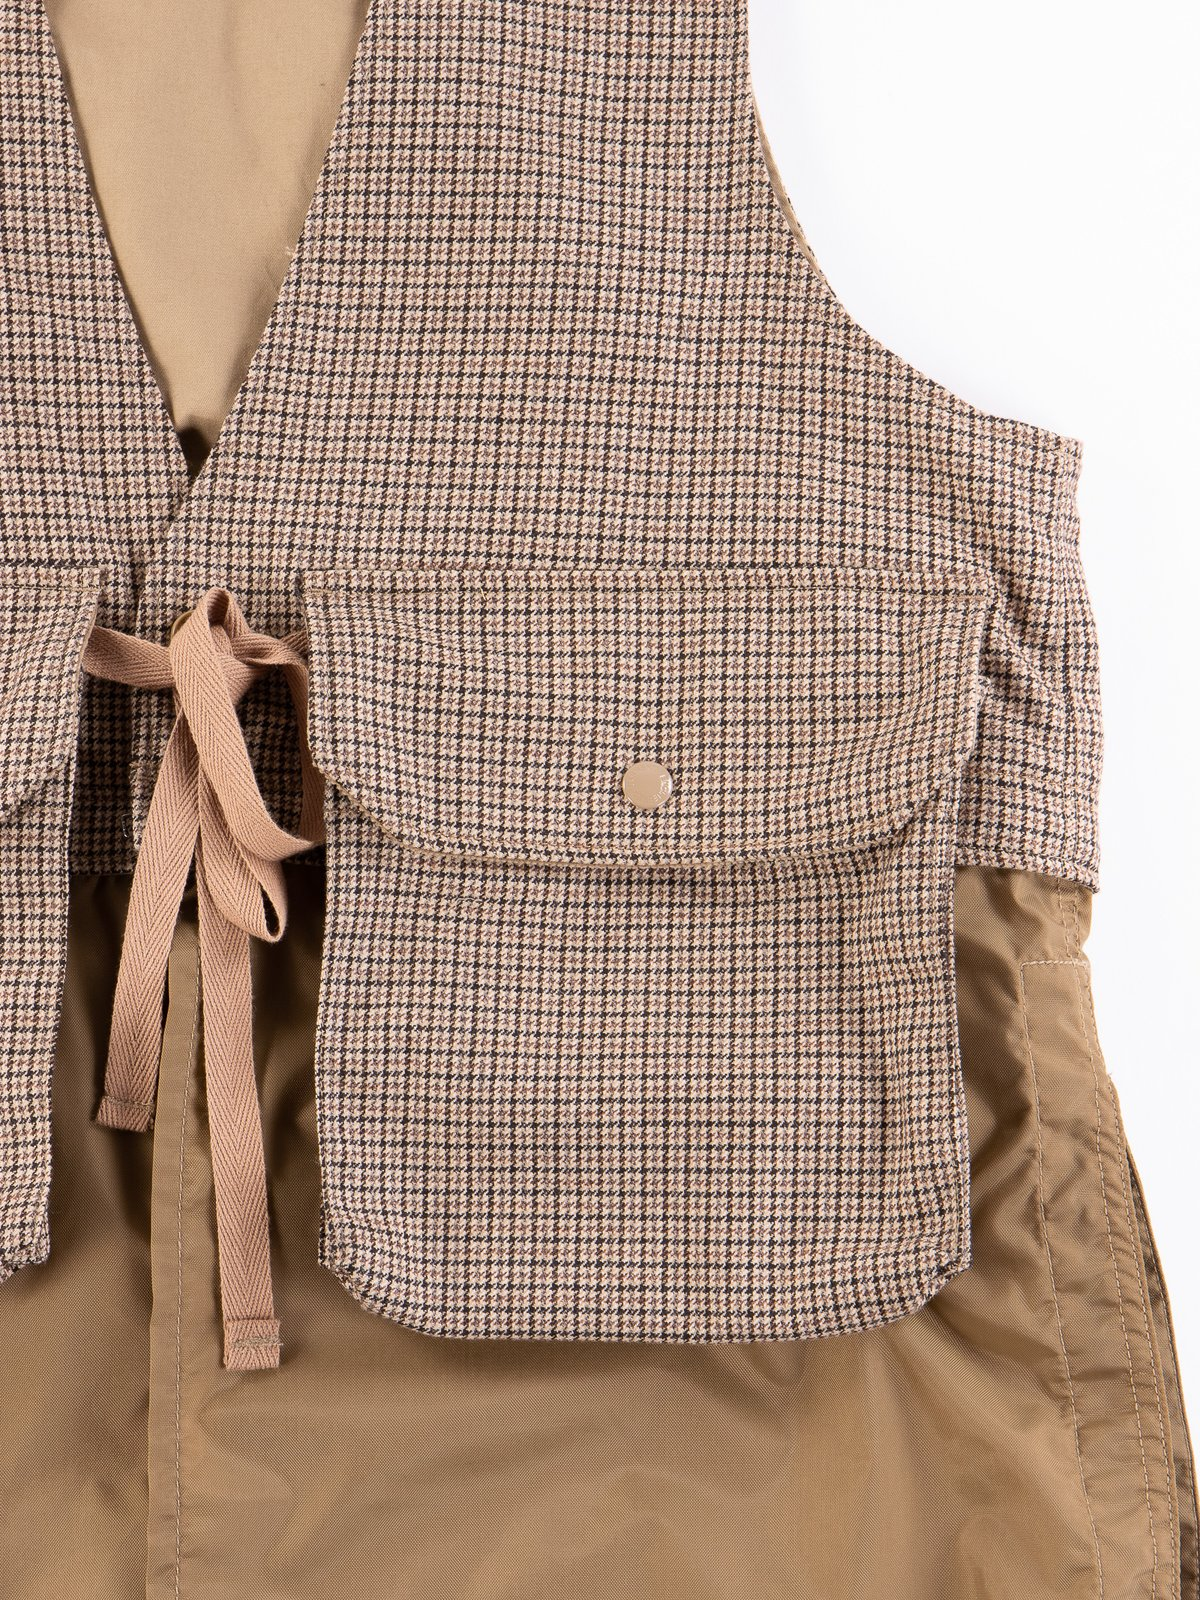 Brown Wool Poly Gunclub Check Long Fowl Vest - Image 4